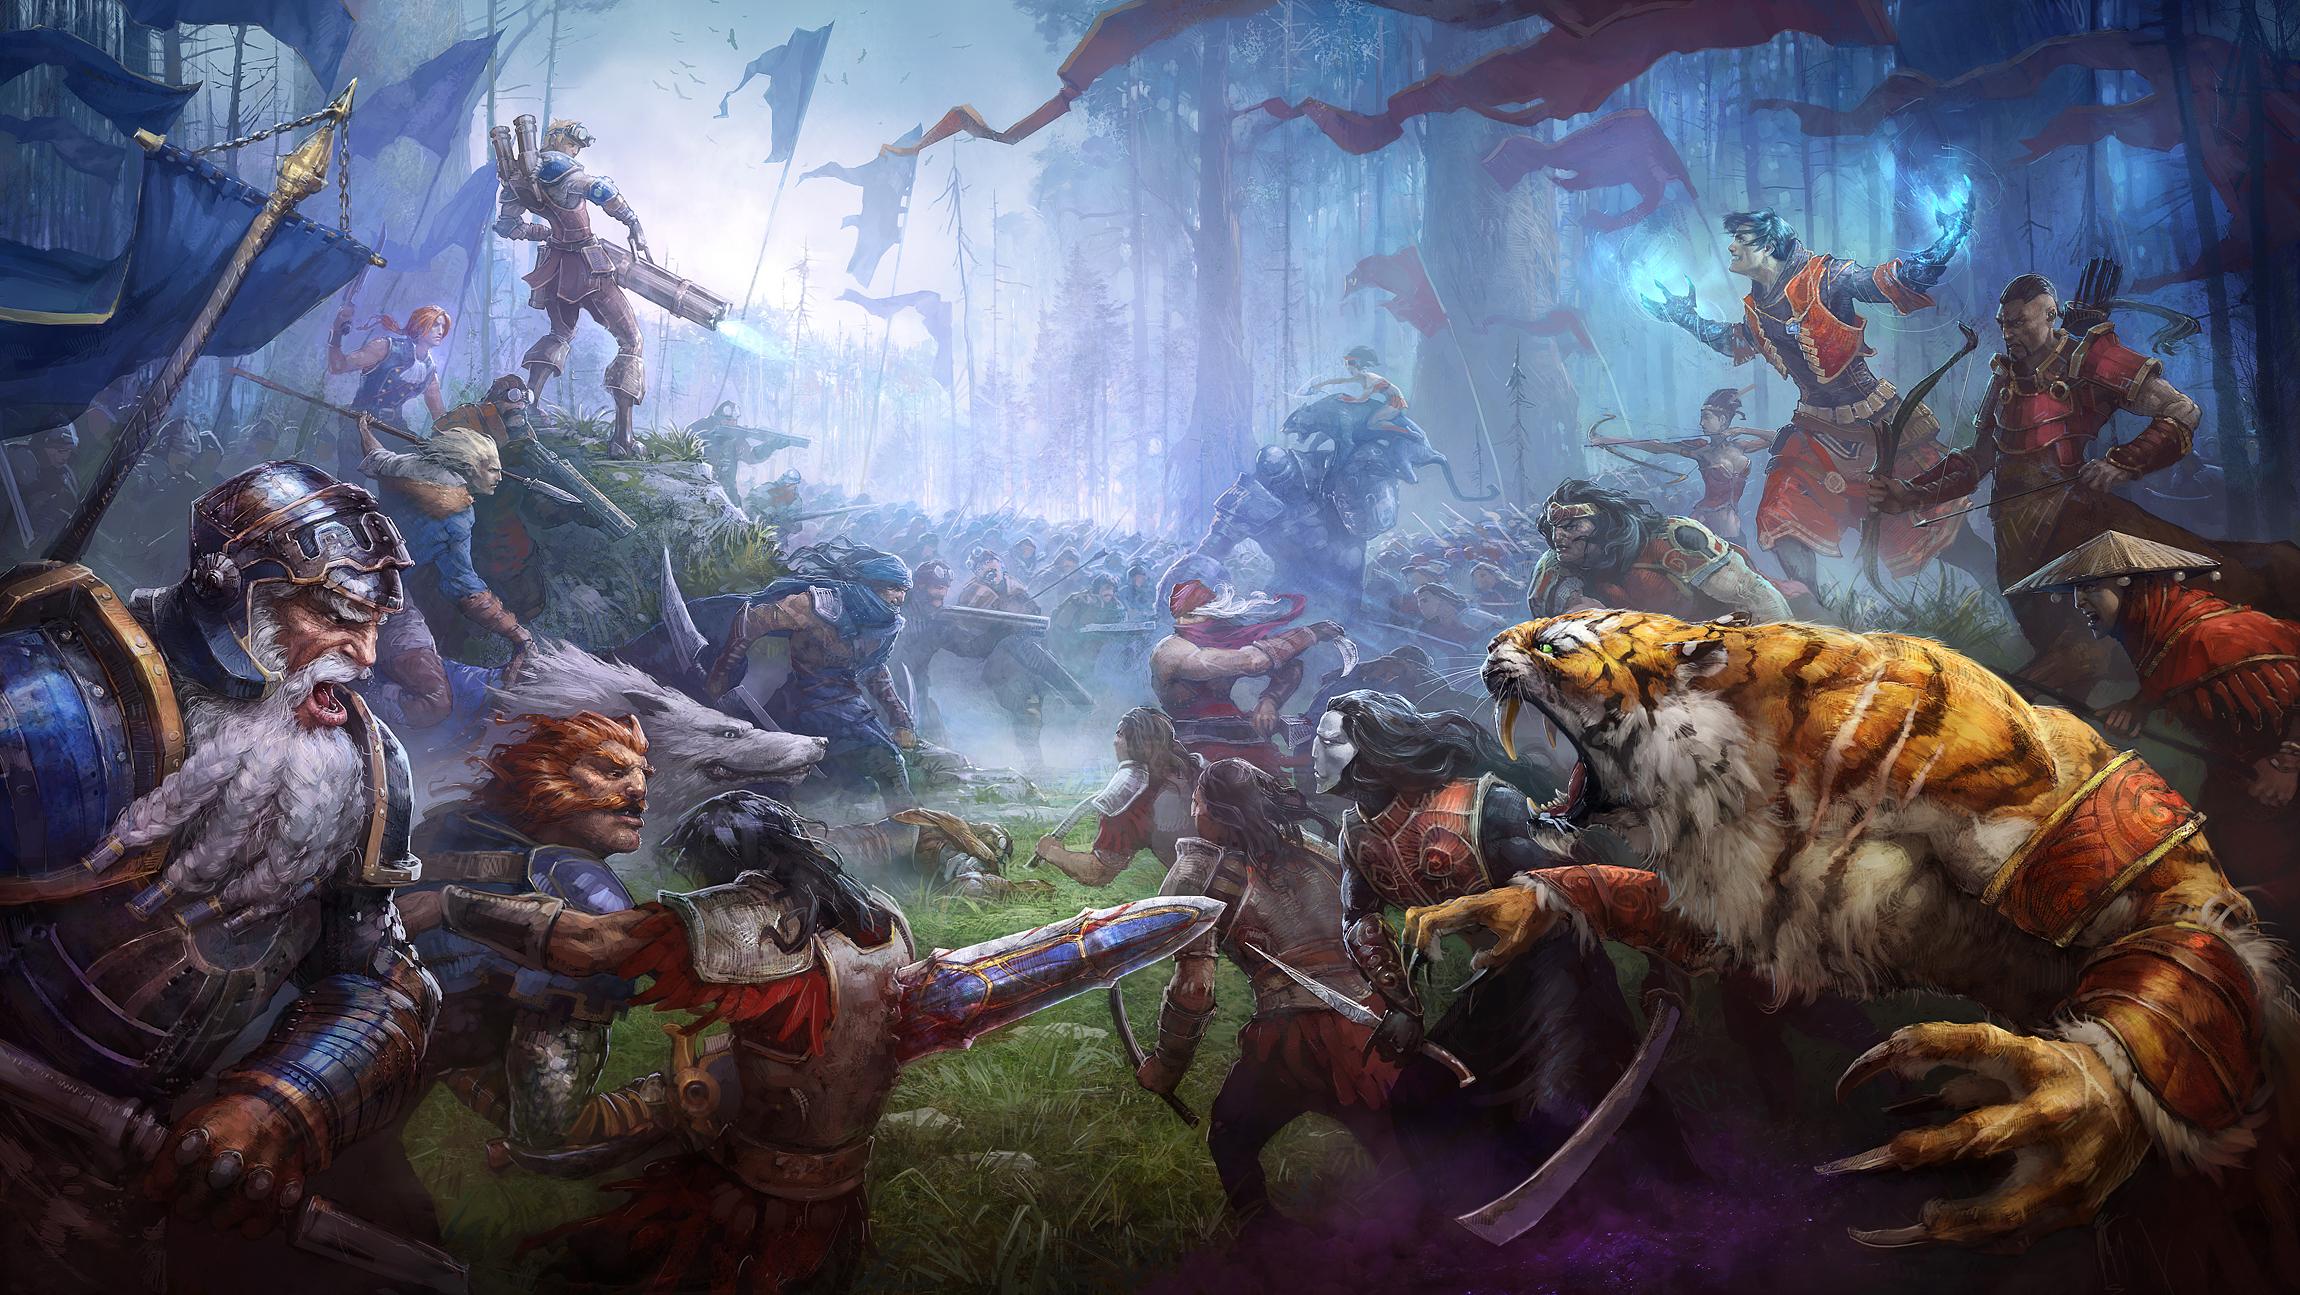 Epic battle fantasy wallpaper - photo#6